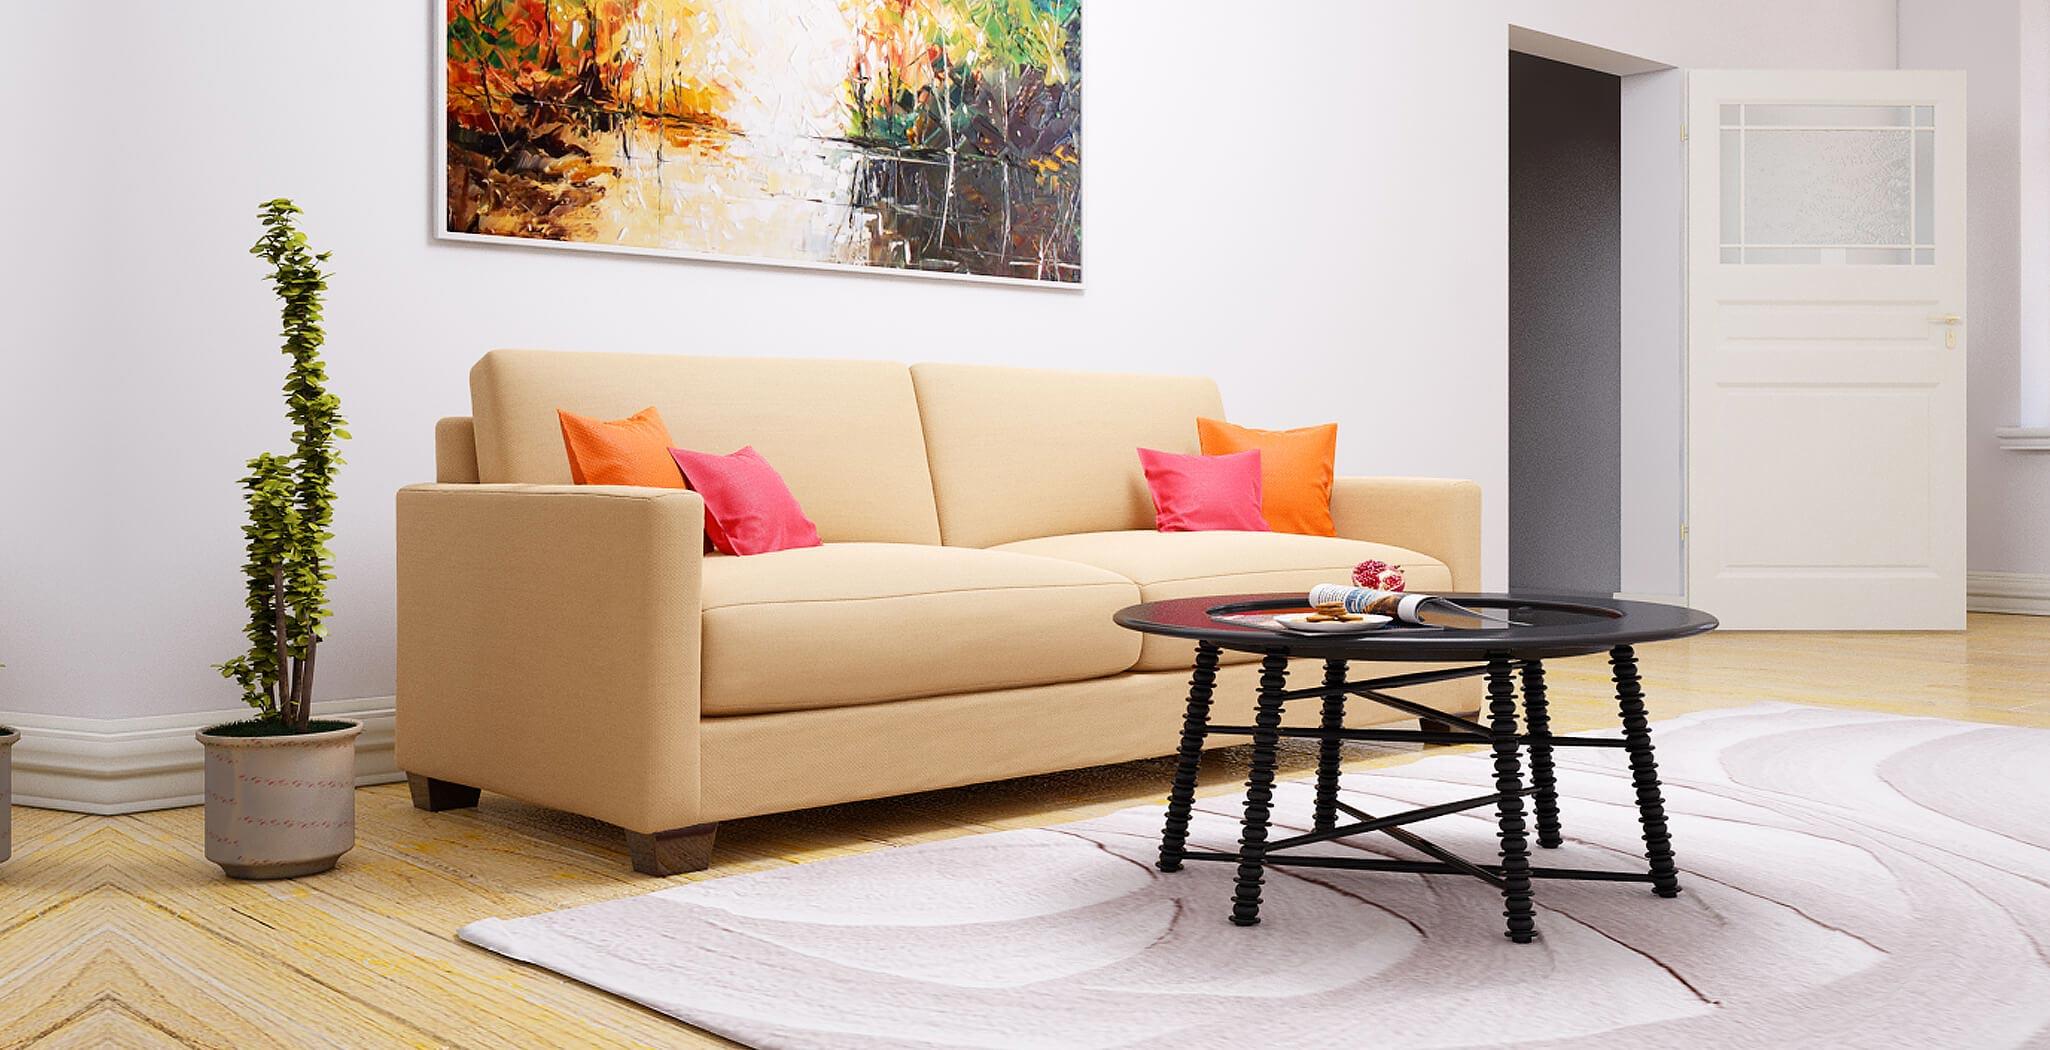 dresden sofa furniture gallery 4